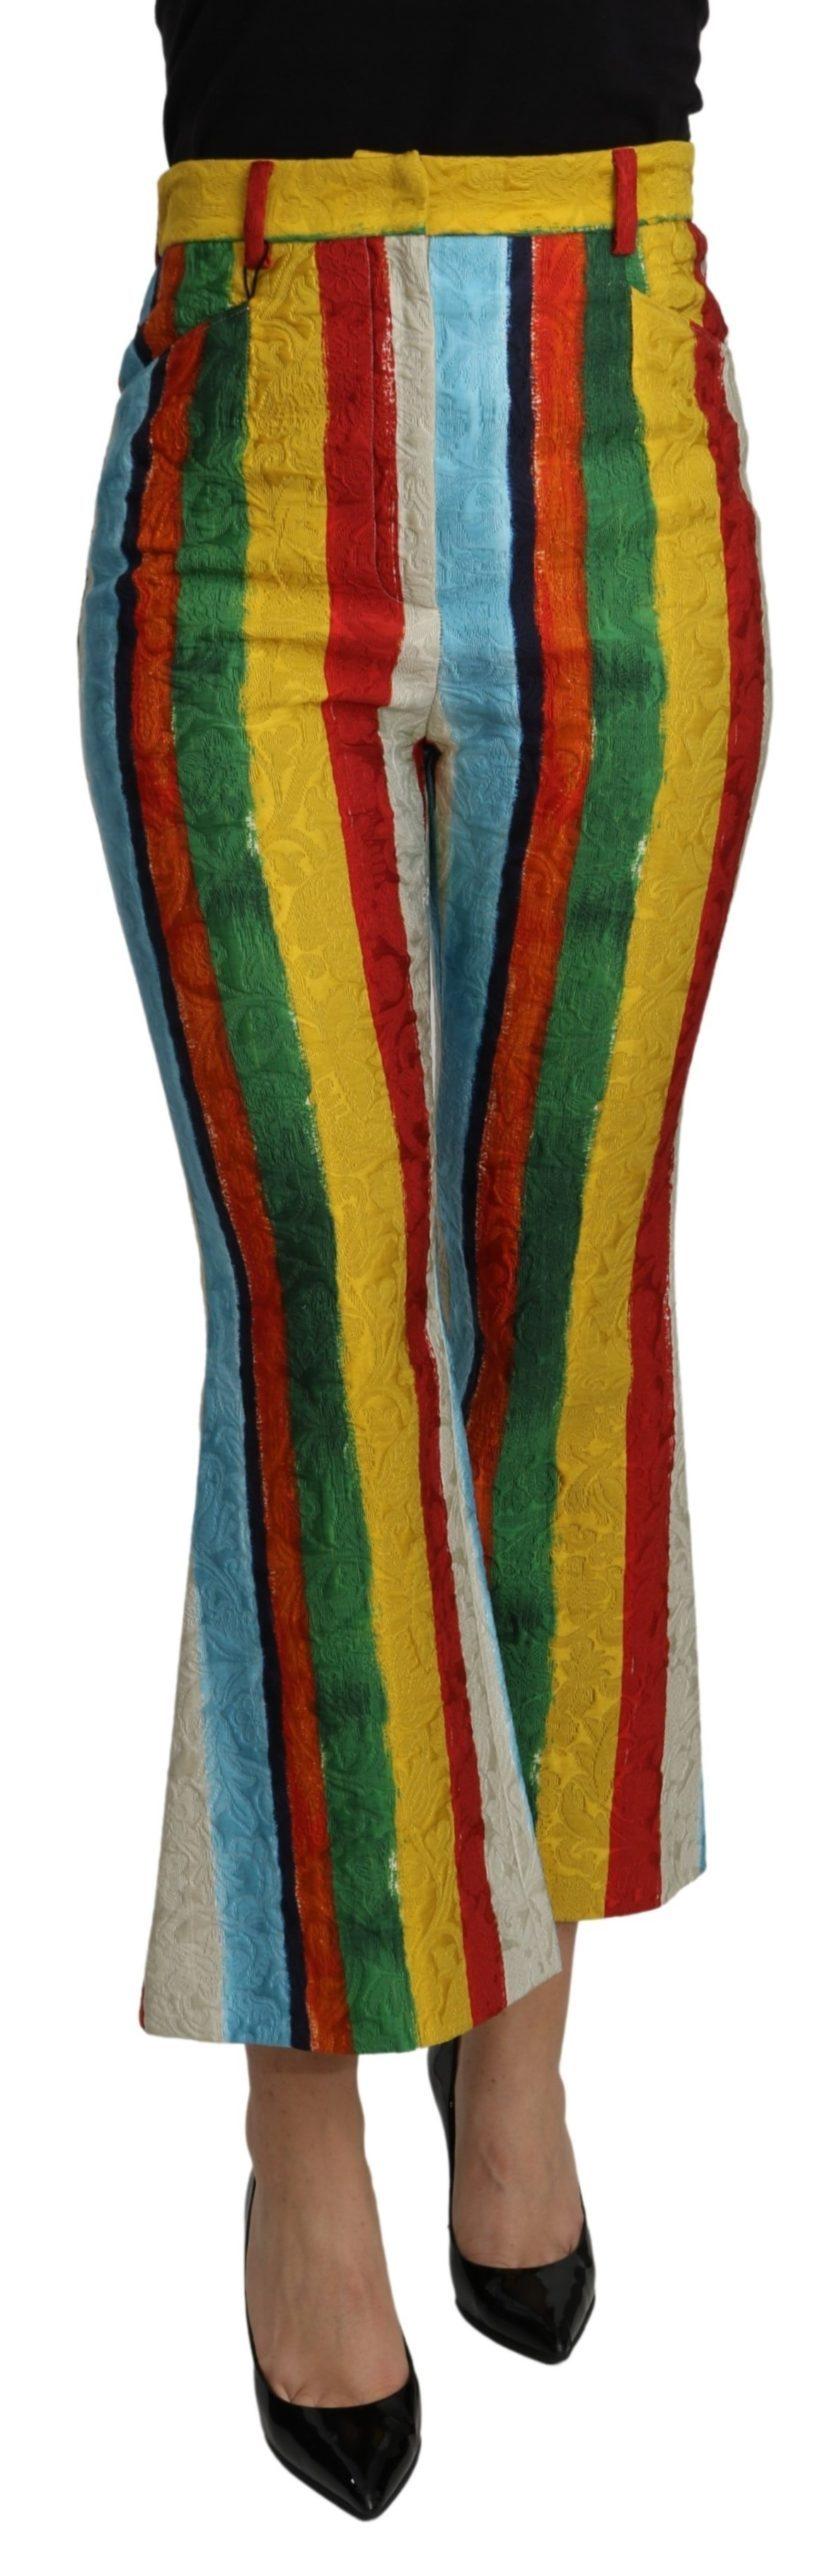 Dolce & Gabbana Women's Stripes Flared Brocade Trouser Multicolor PAN71090 - IT36   XS